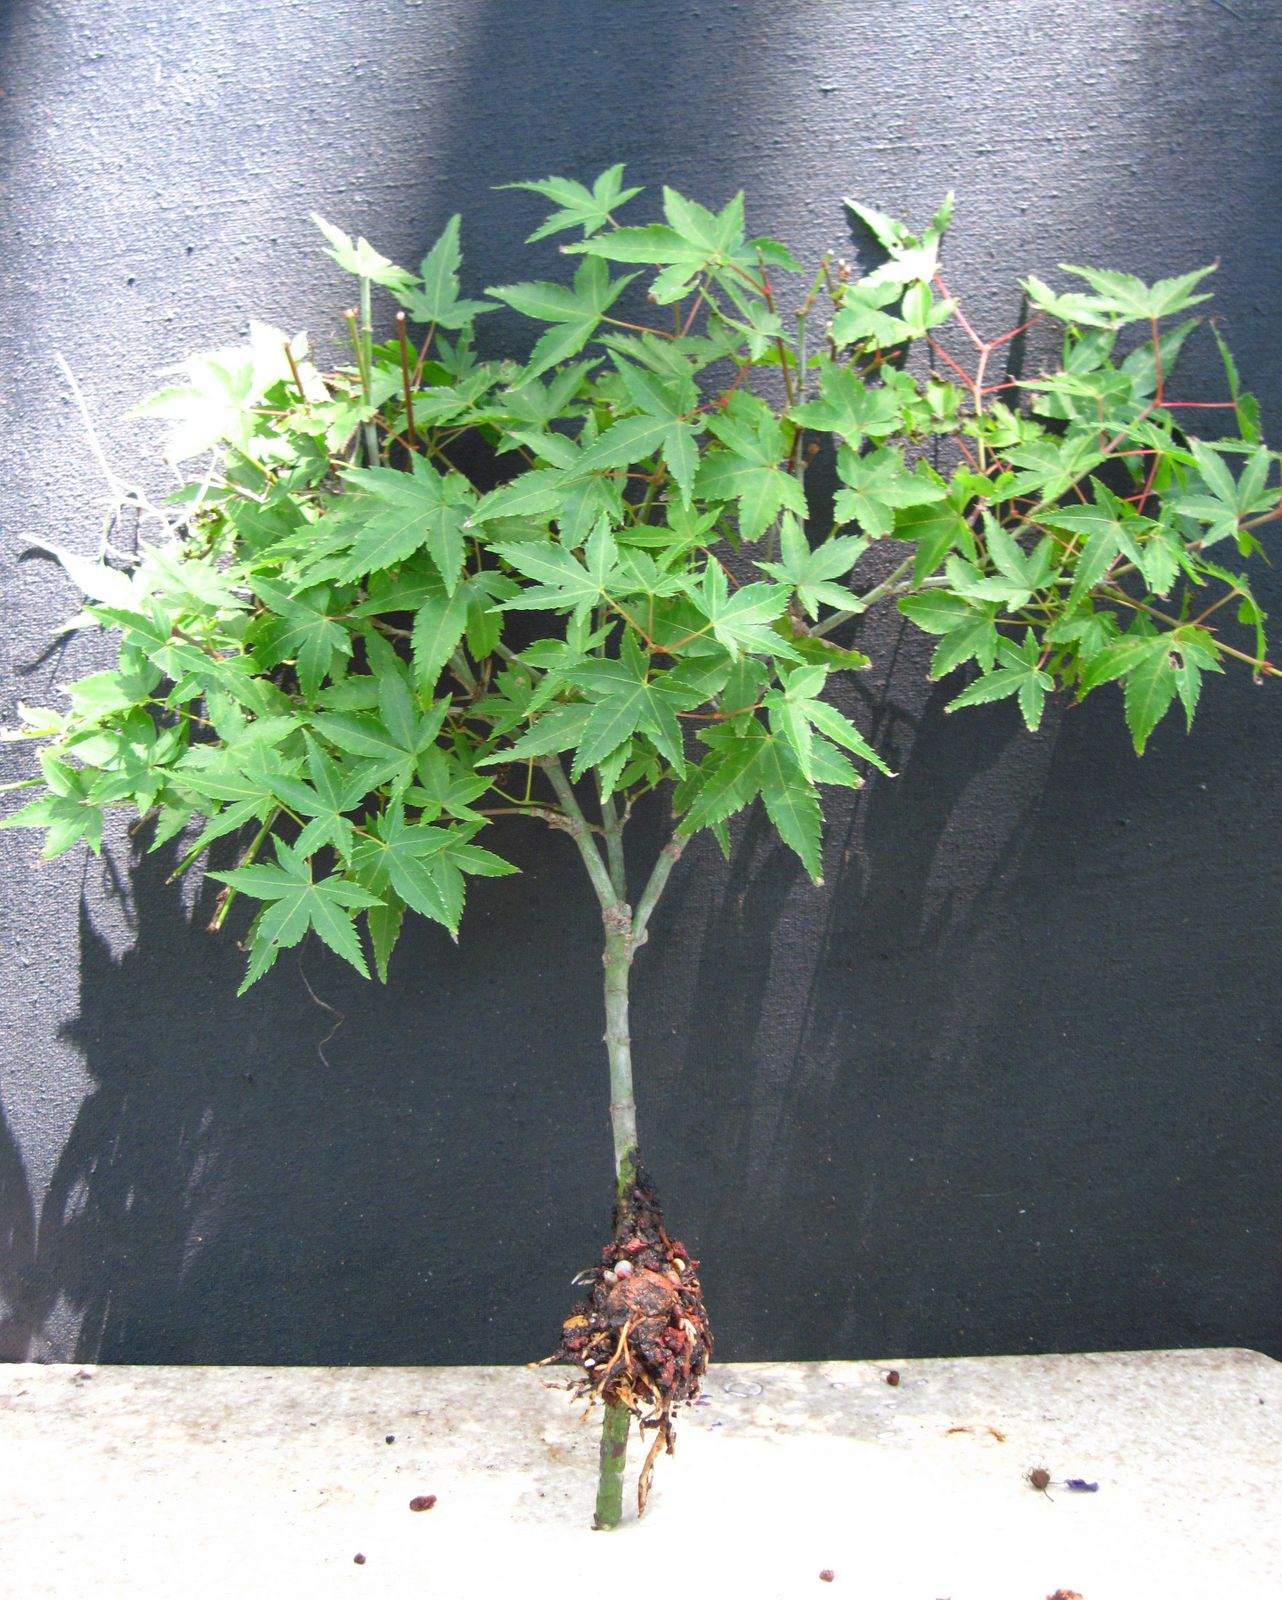 Bonsai Beginnings: Kotohime Japanese Maple